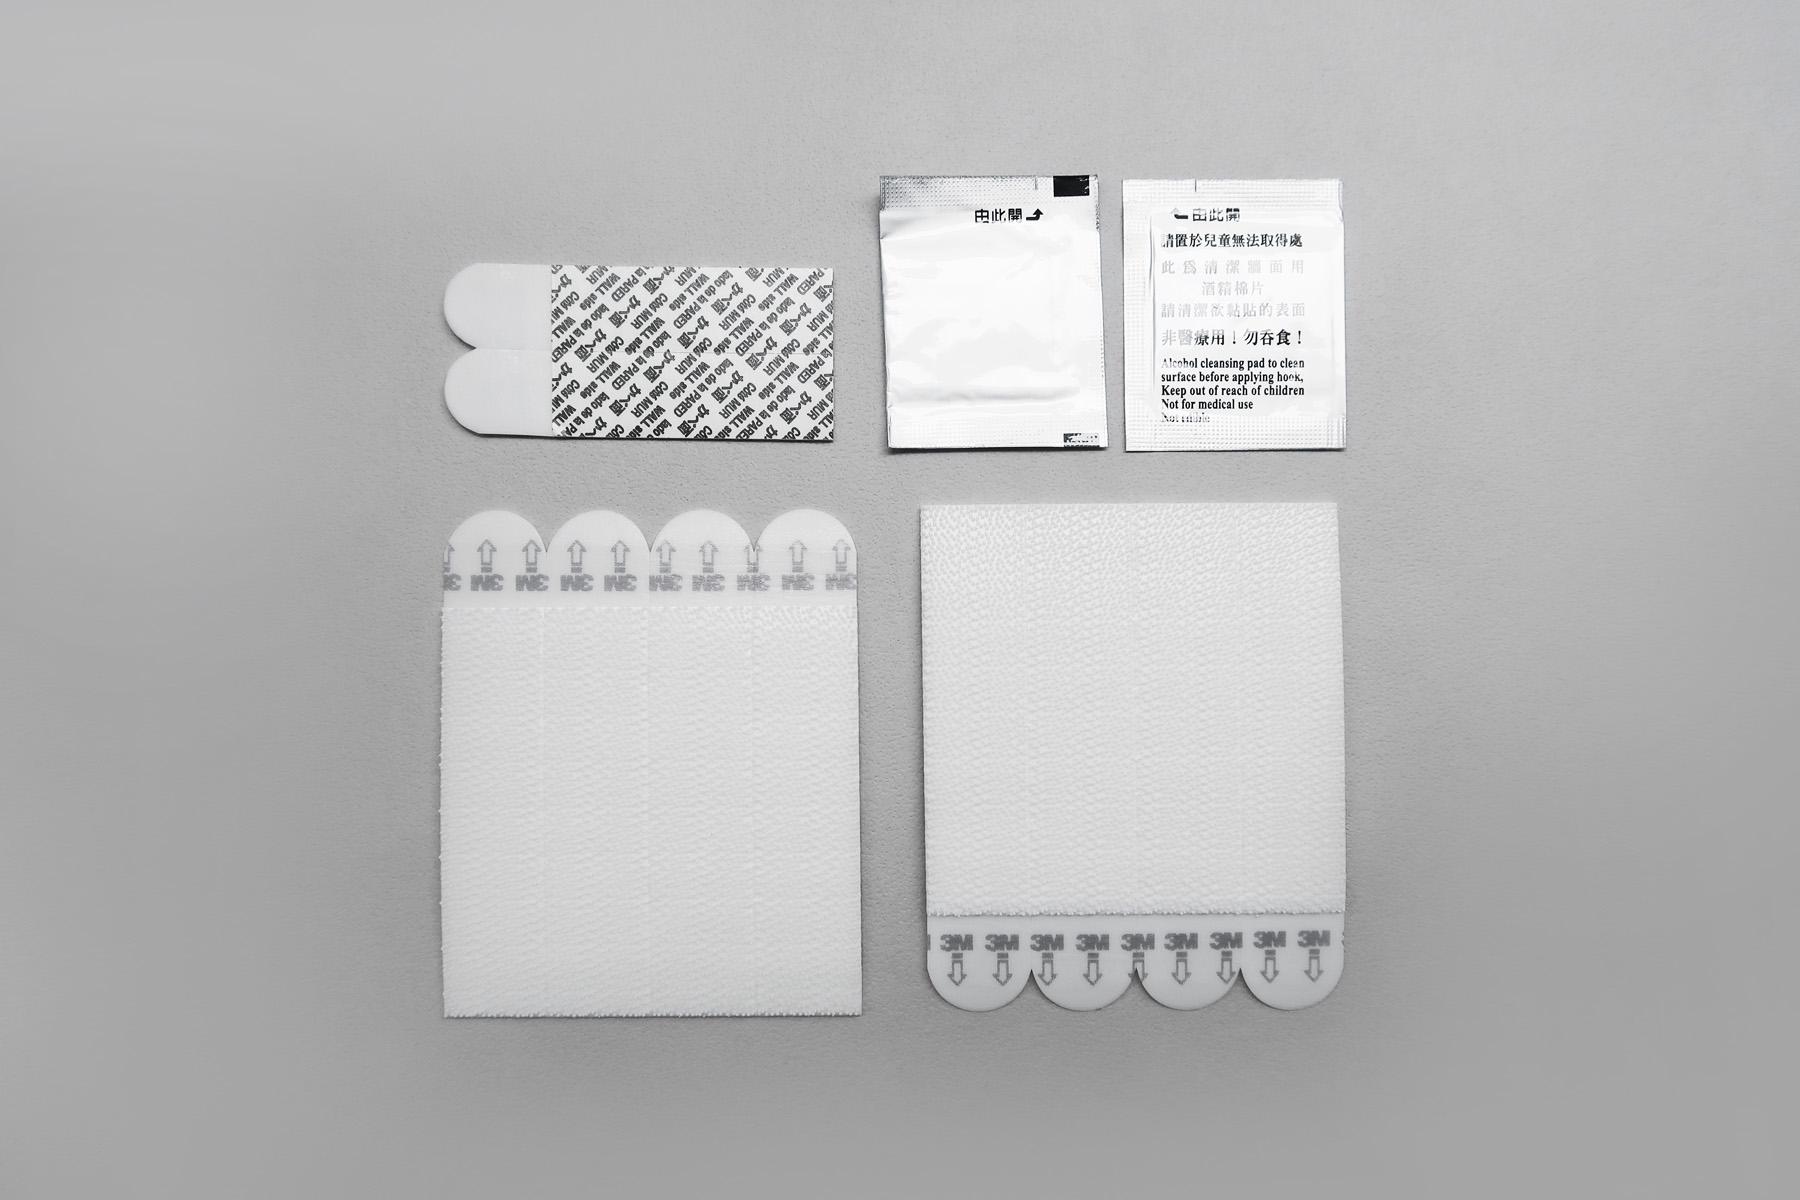 DIY 居家佈置 / 幾何美學・3M 無痕置物收納 - STEP2 準備